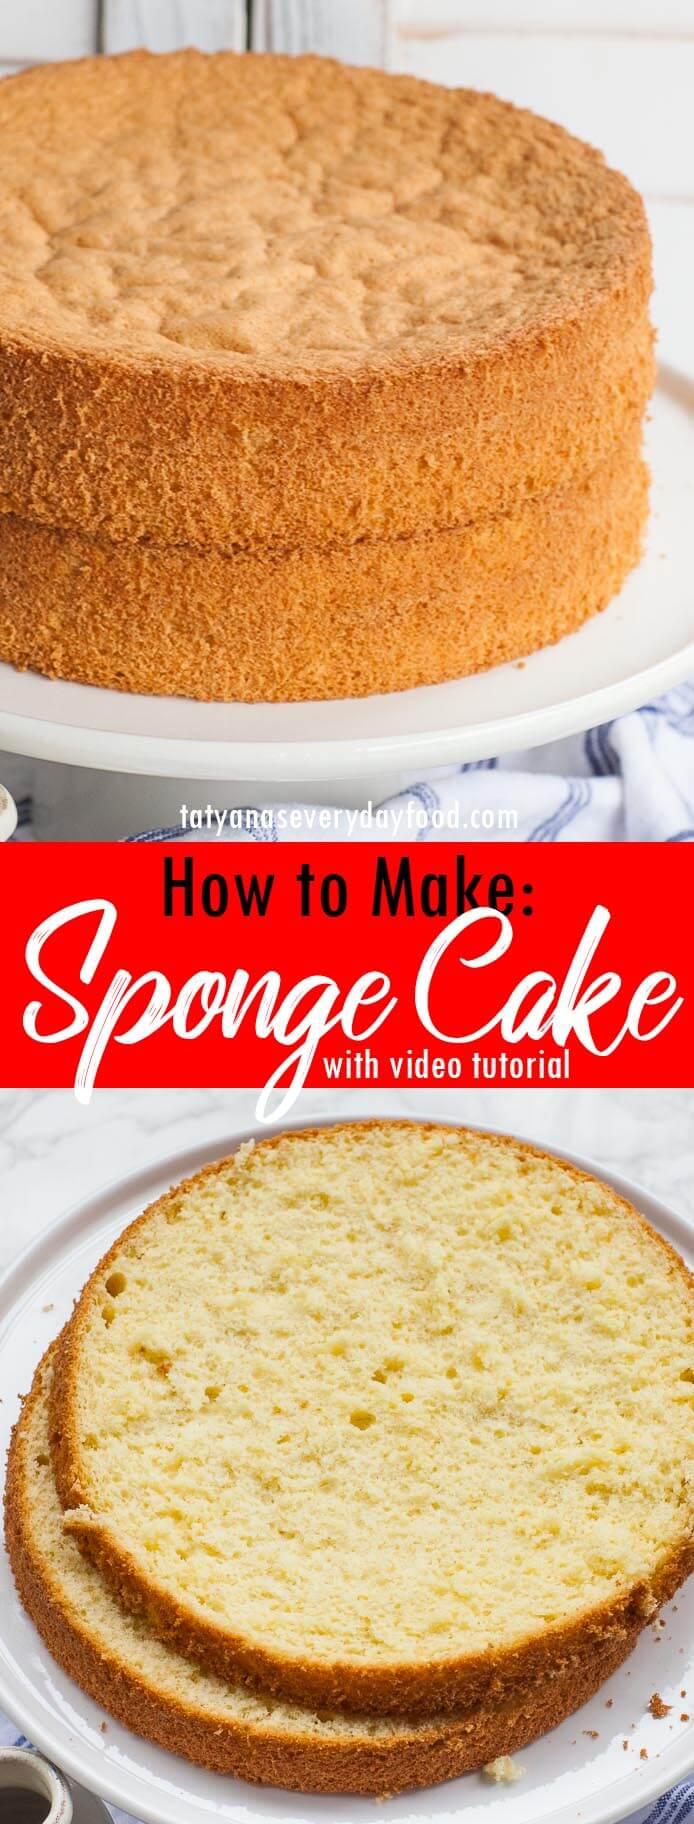 How to Make a Sponge Cake video recipe